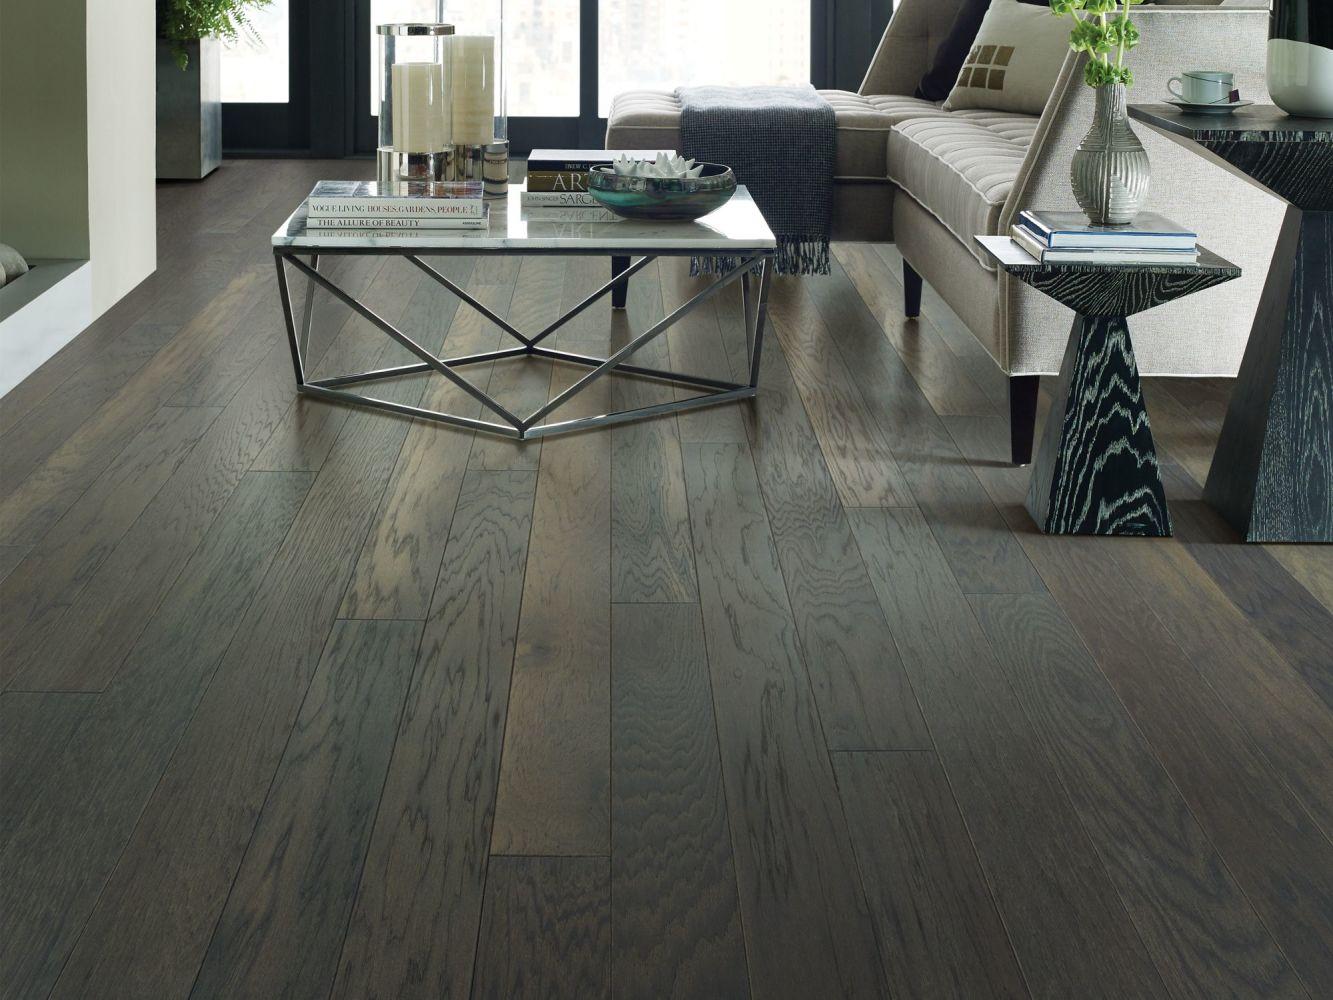 Shaw Floors Reality Homes Mt Rainer Sable 09022_205RH